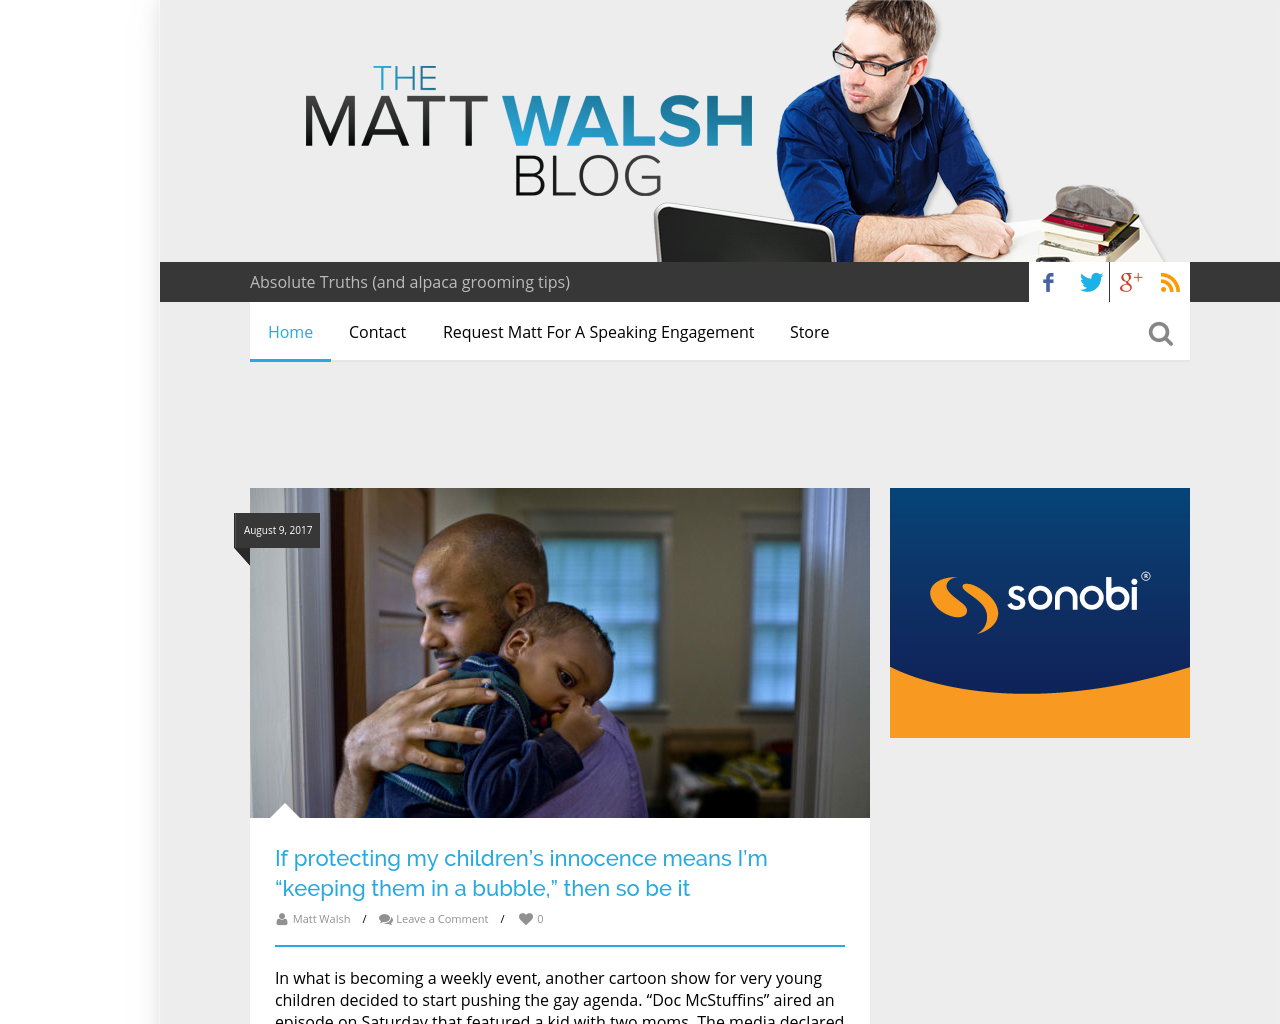 The-Matt-Walsh-Blog-Advertising-Reviews-Pricing